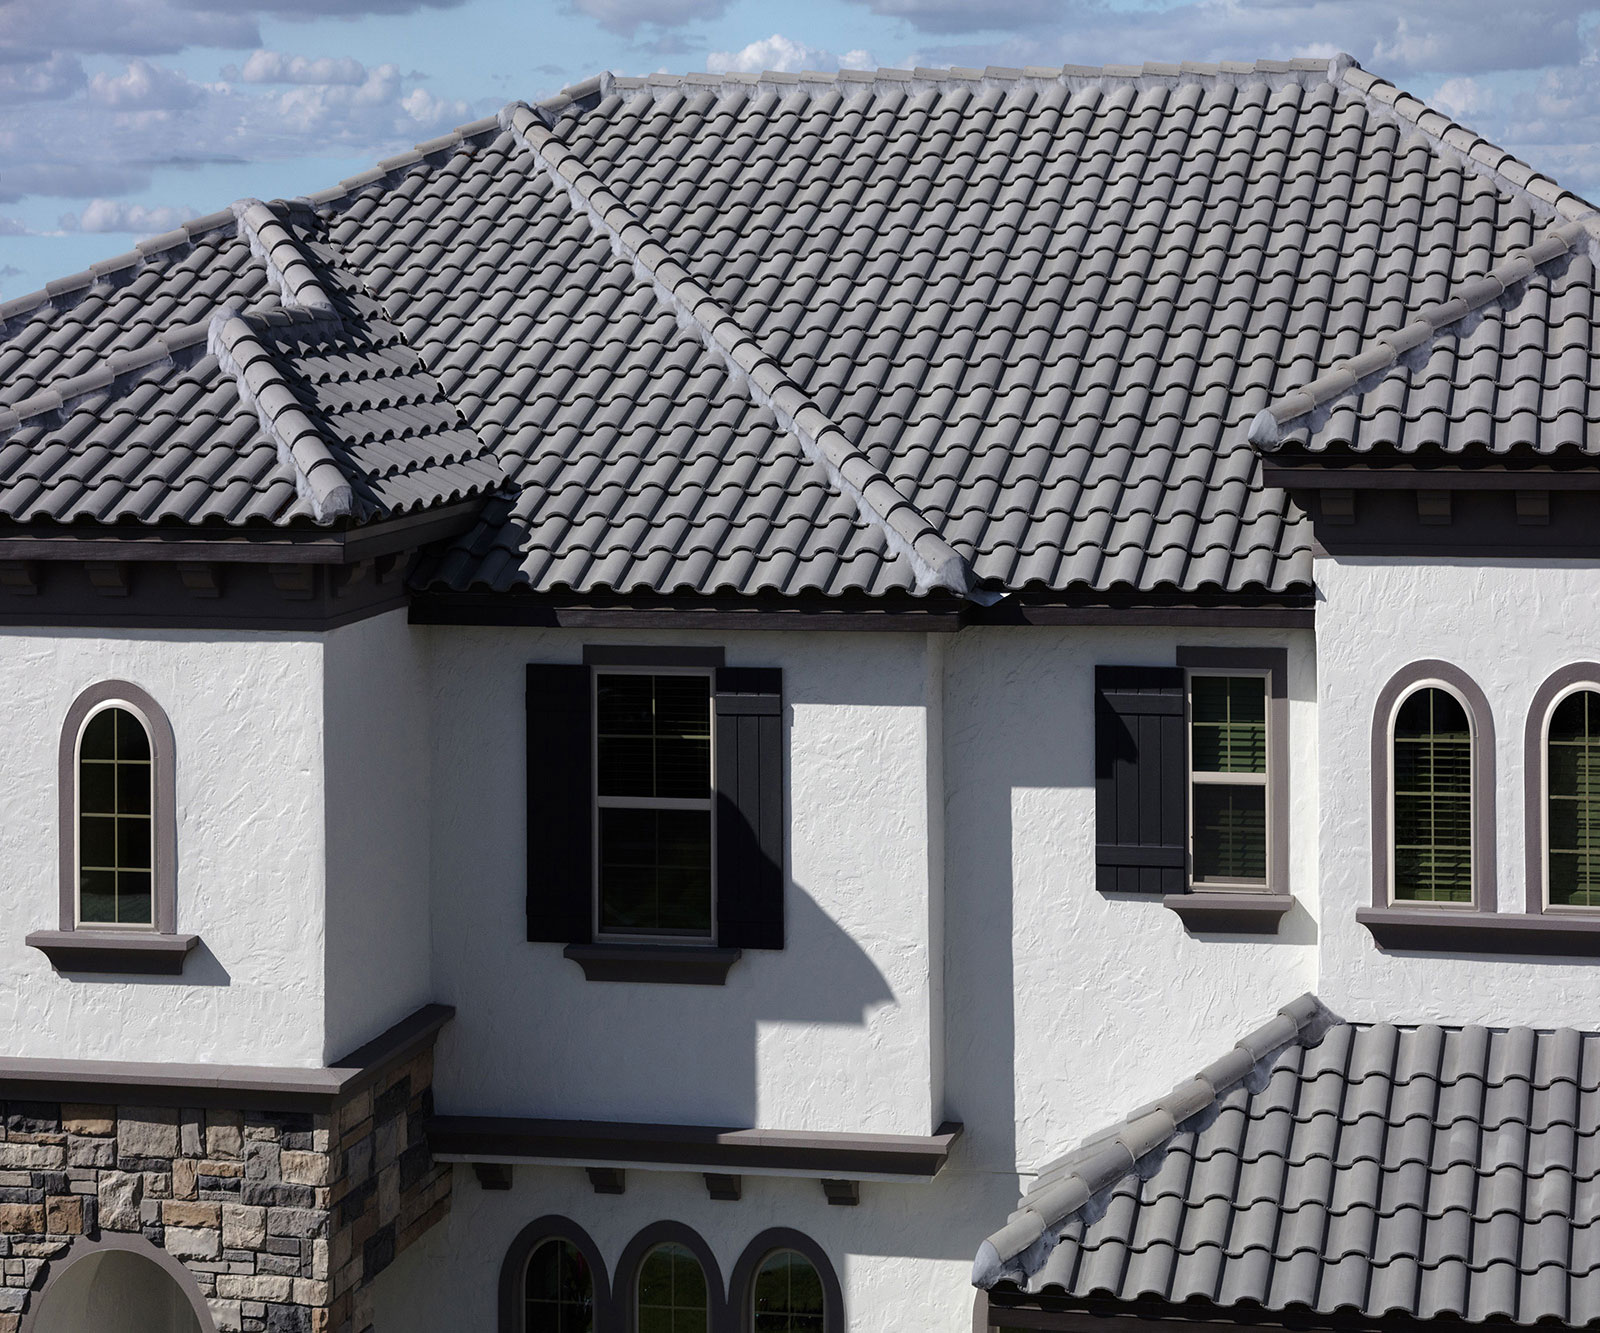 3679 eagle roofing for Barrel tile roof colors